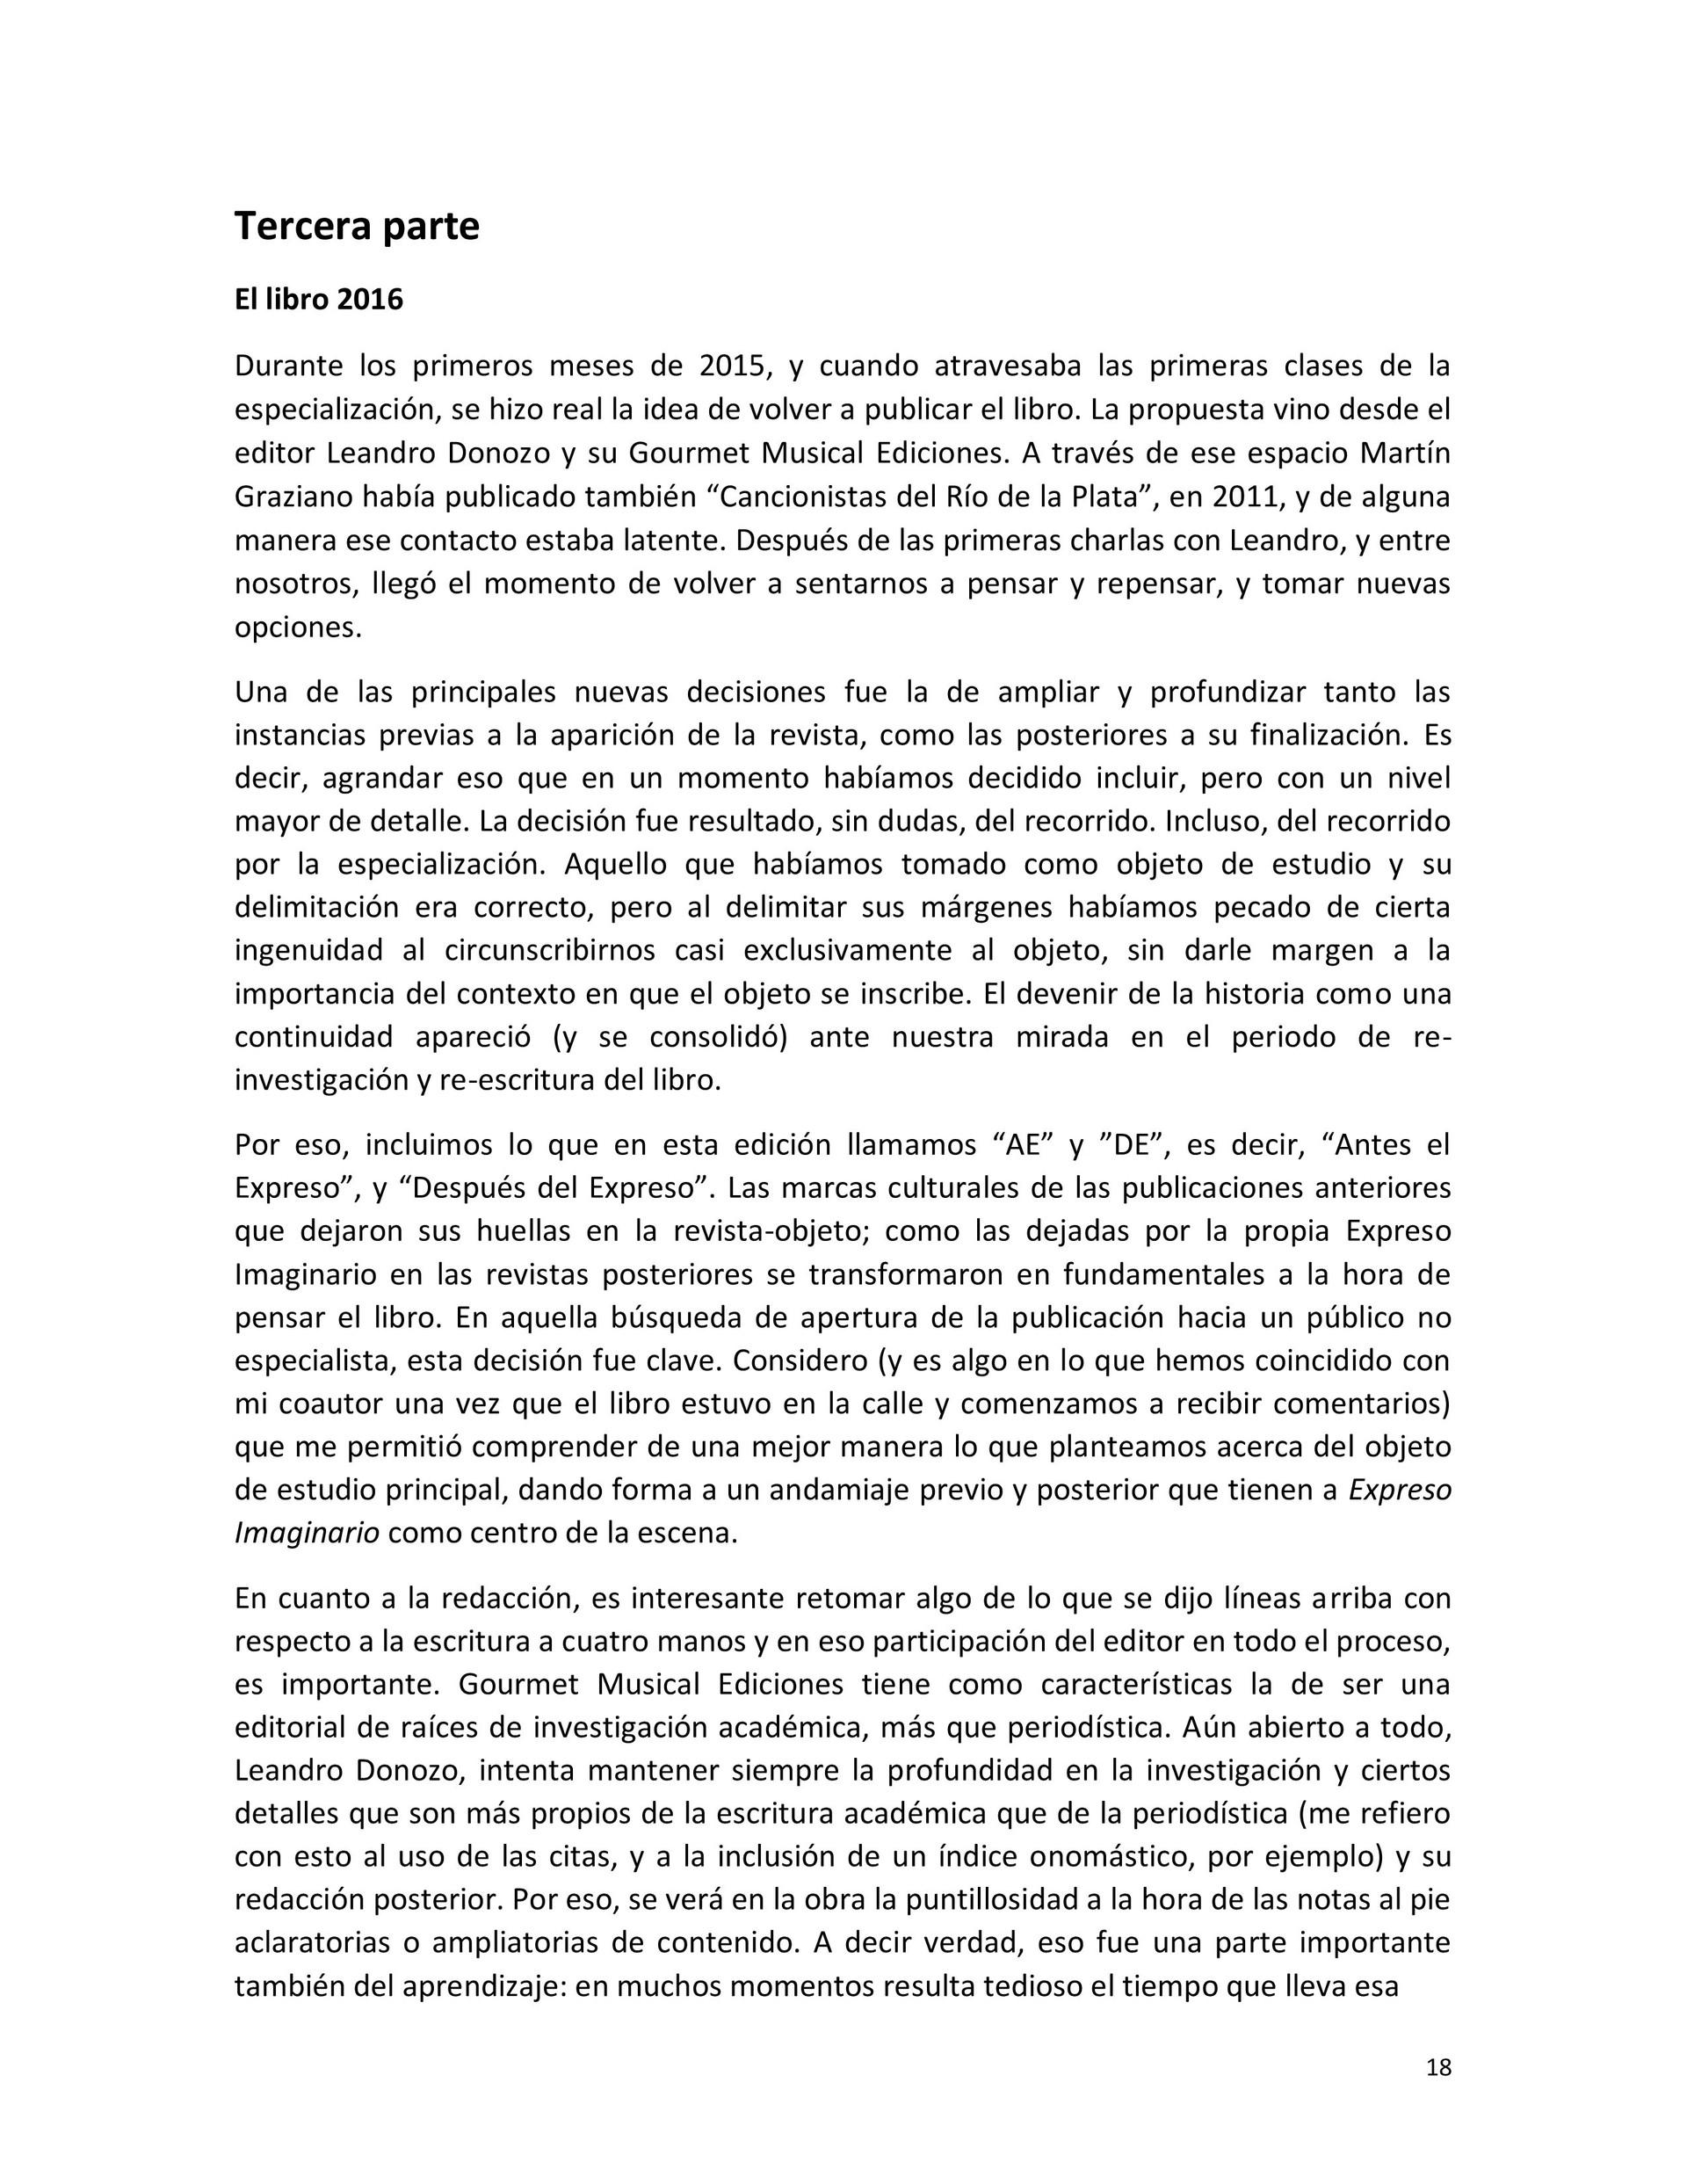 estacion_Page_17.jpeg